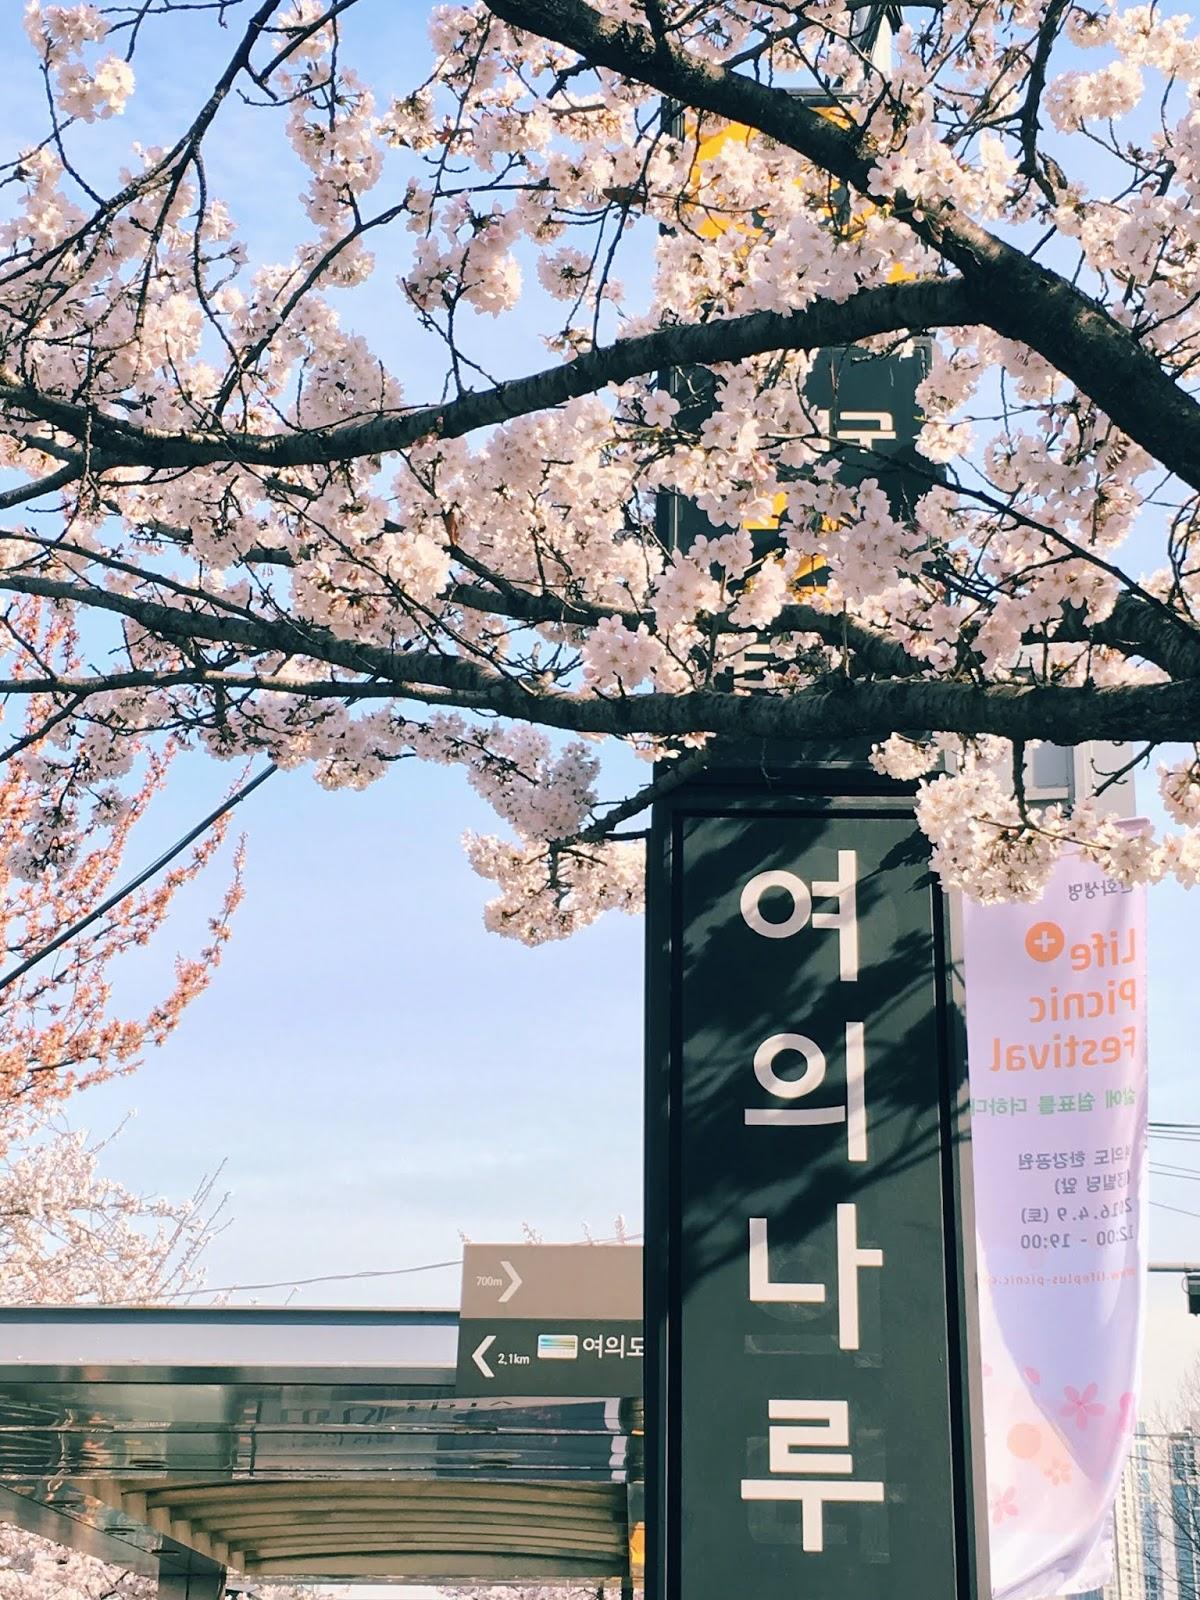 cherry blossom festival in south korea